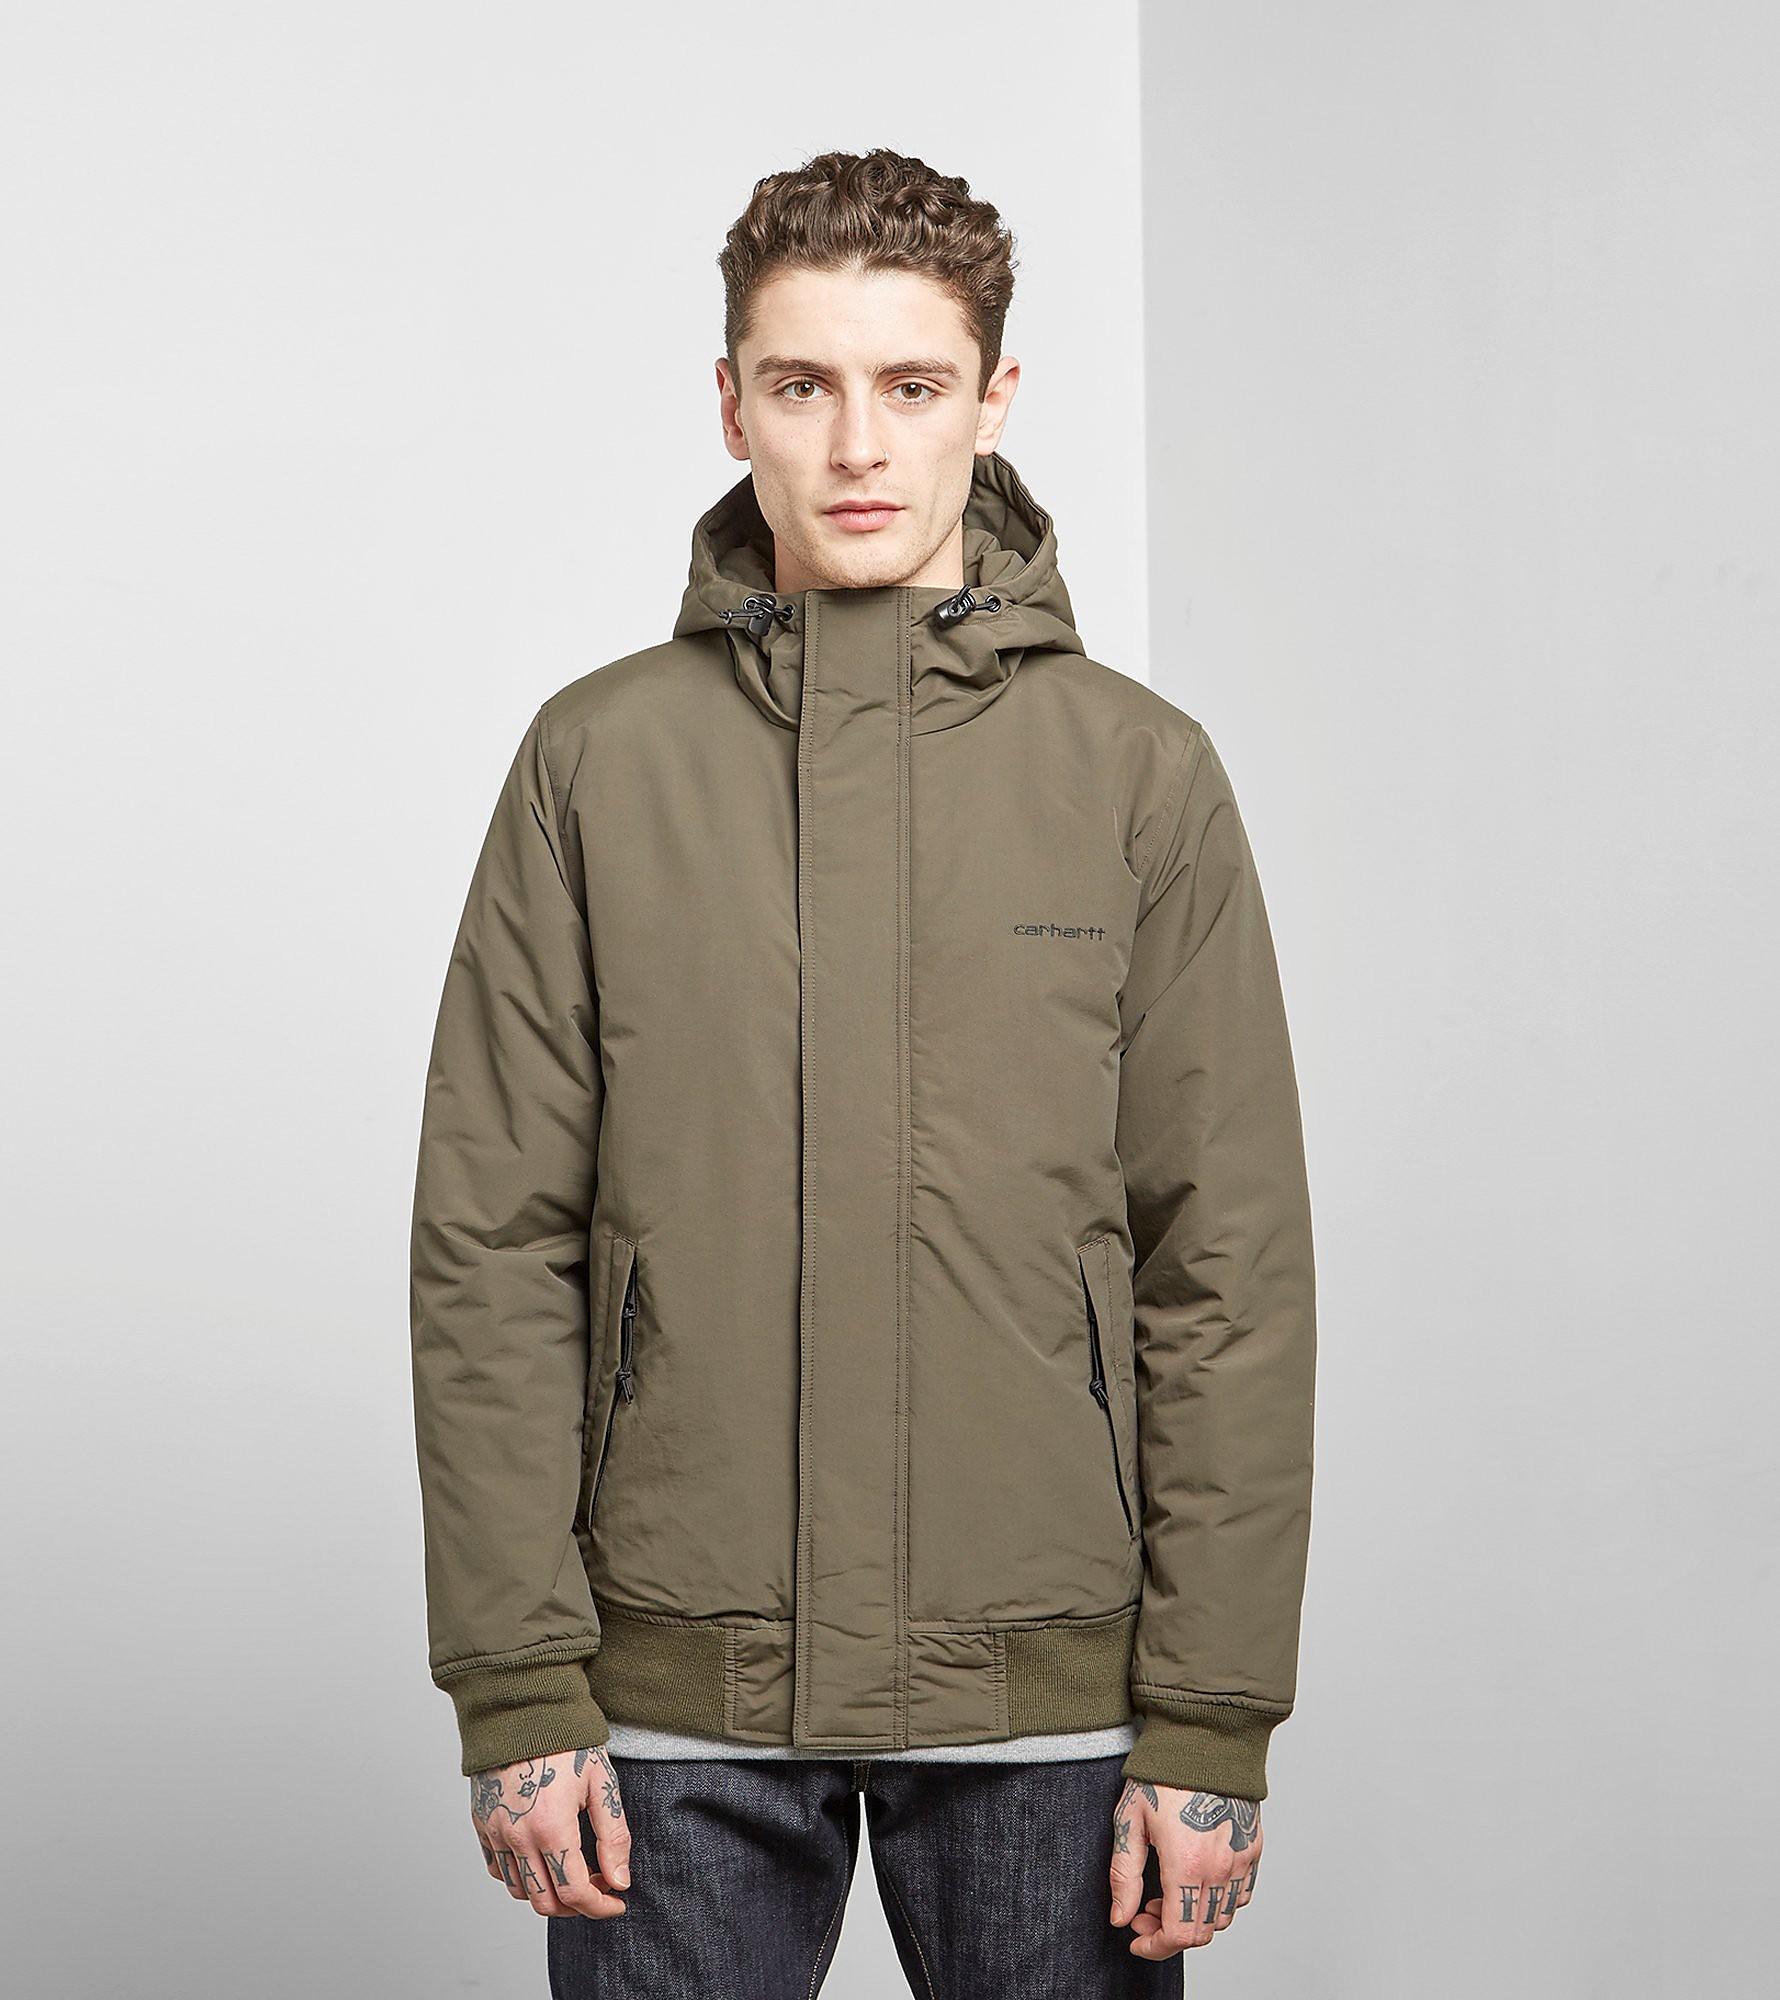 Carhartt WIP Kodaik Blouson Jacket